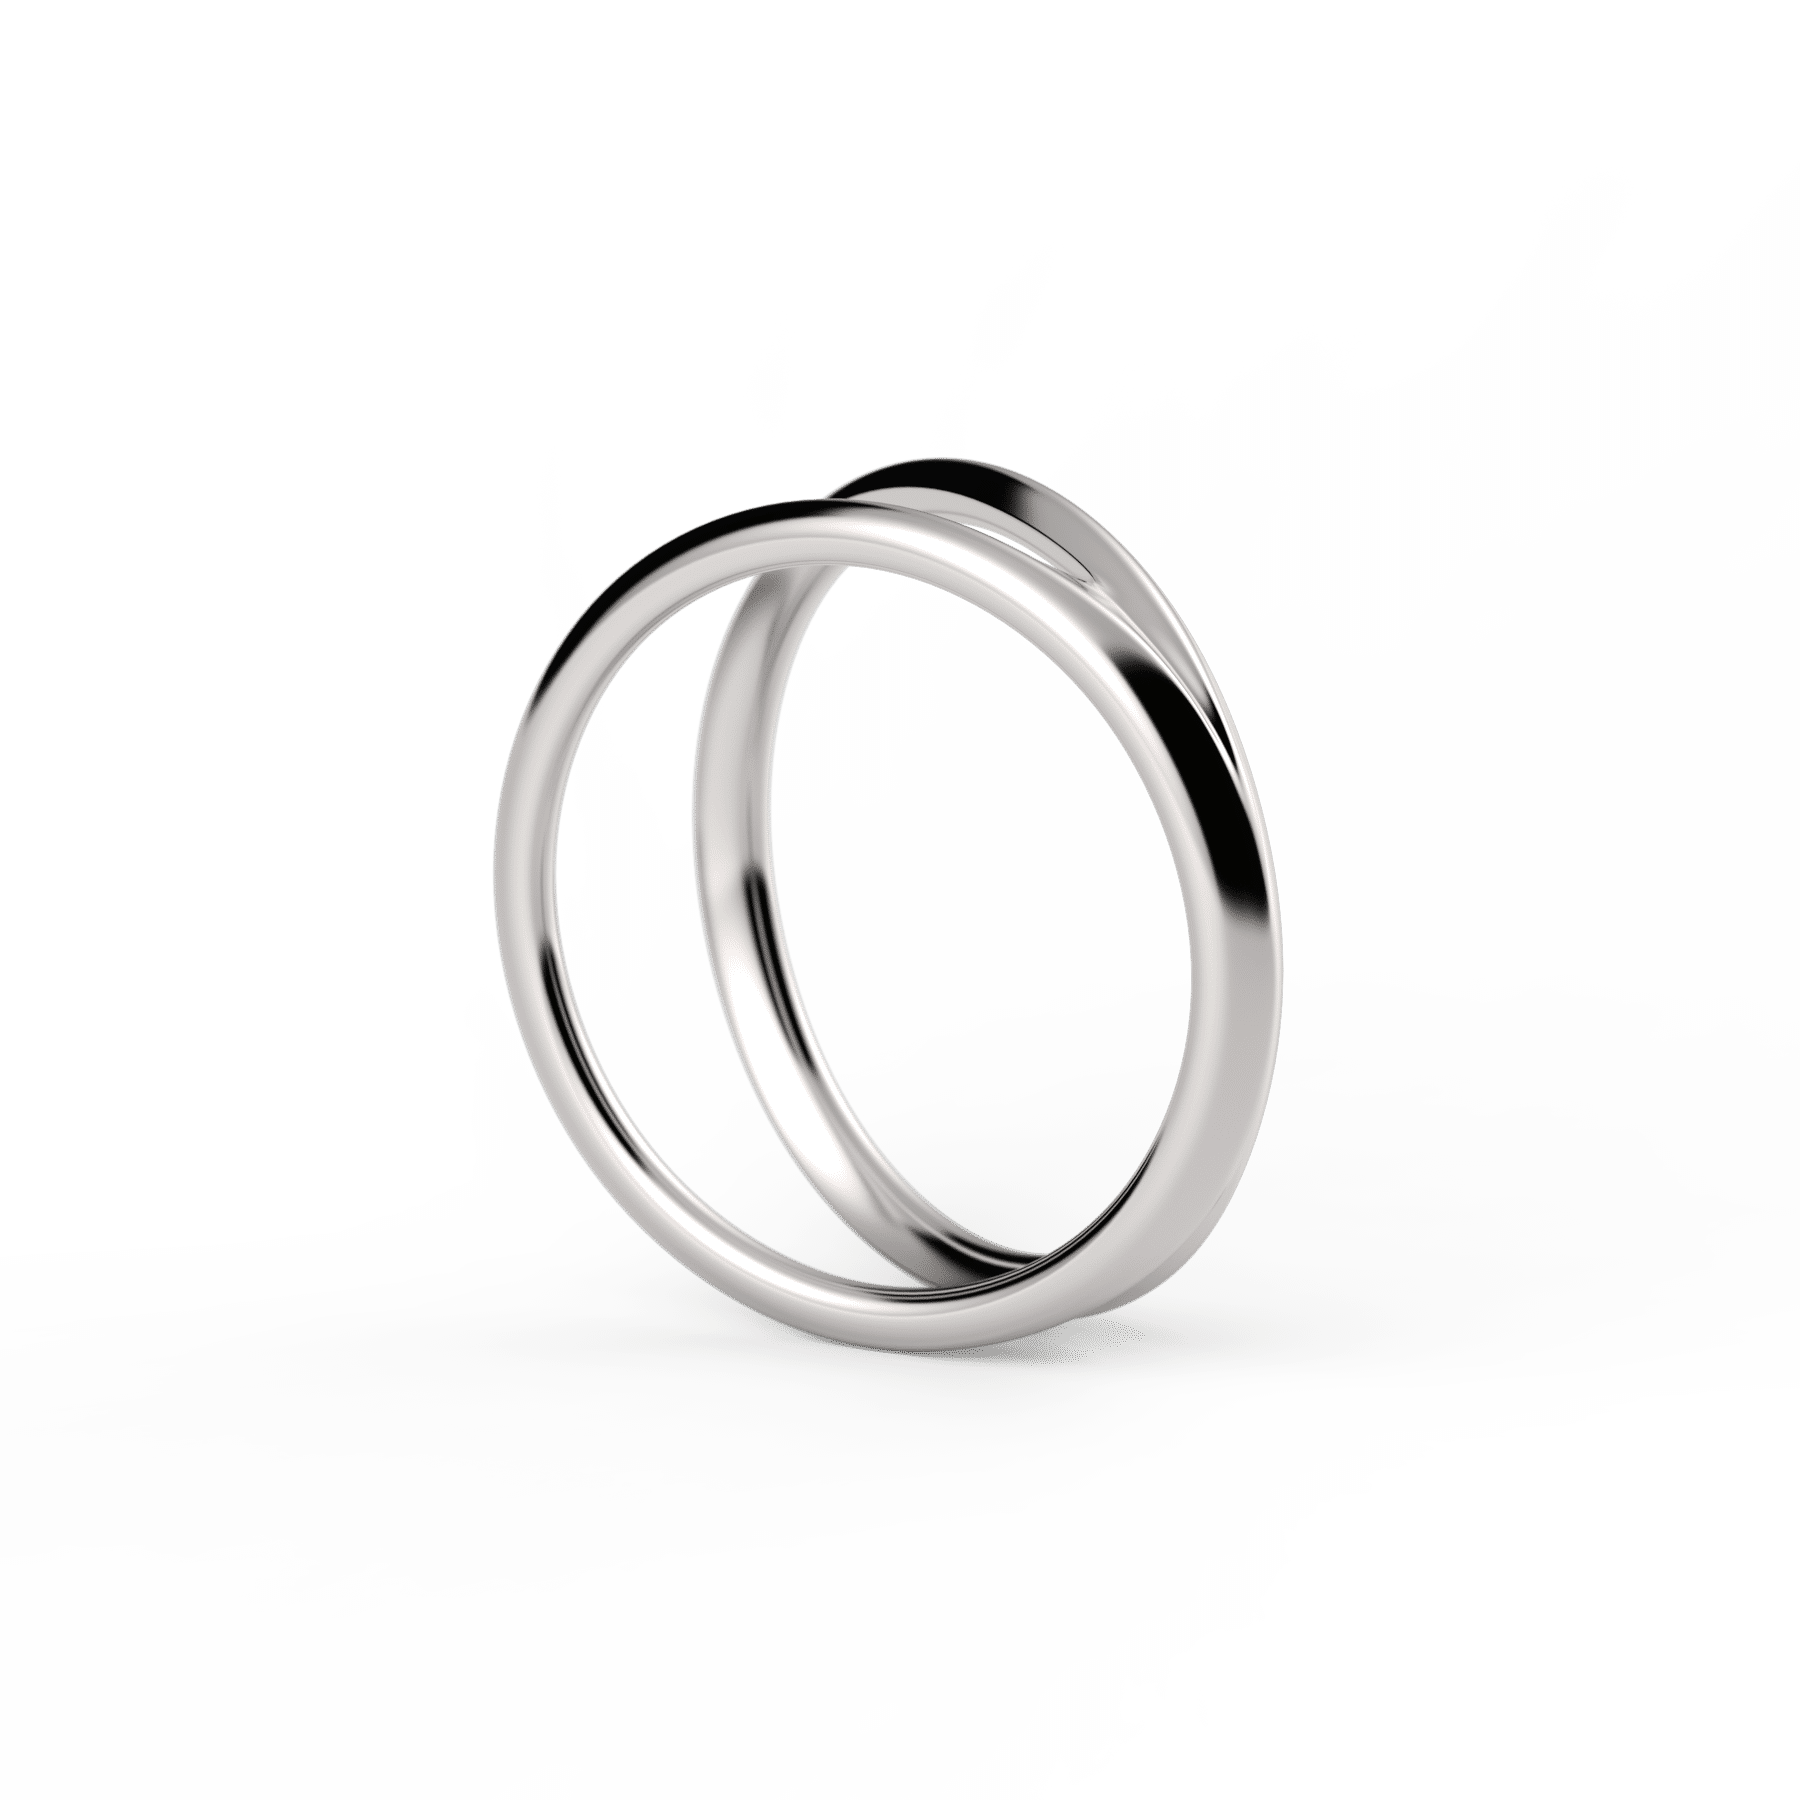 ADEL ring